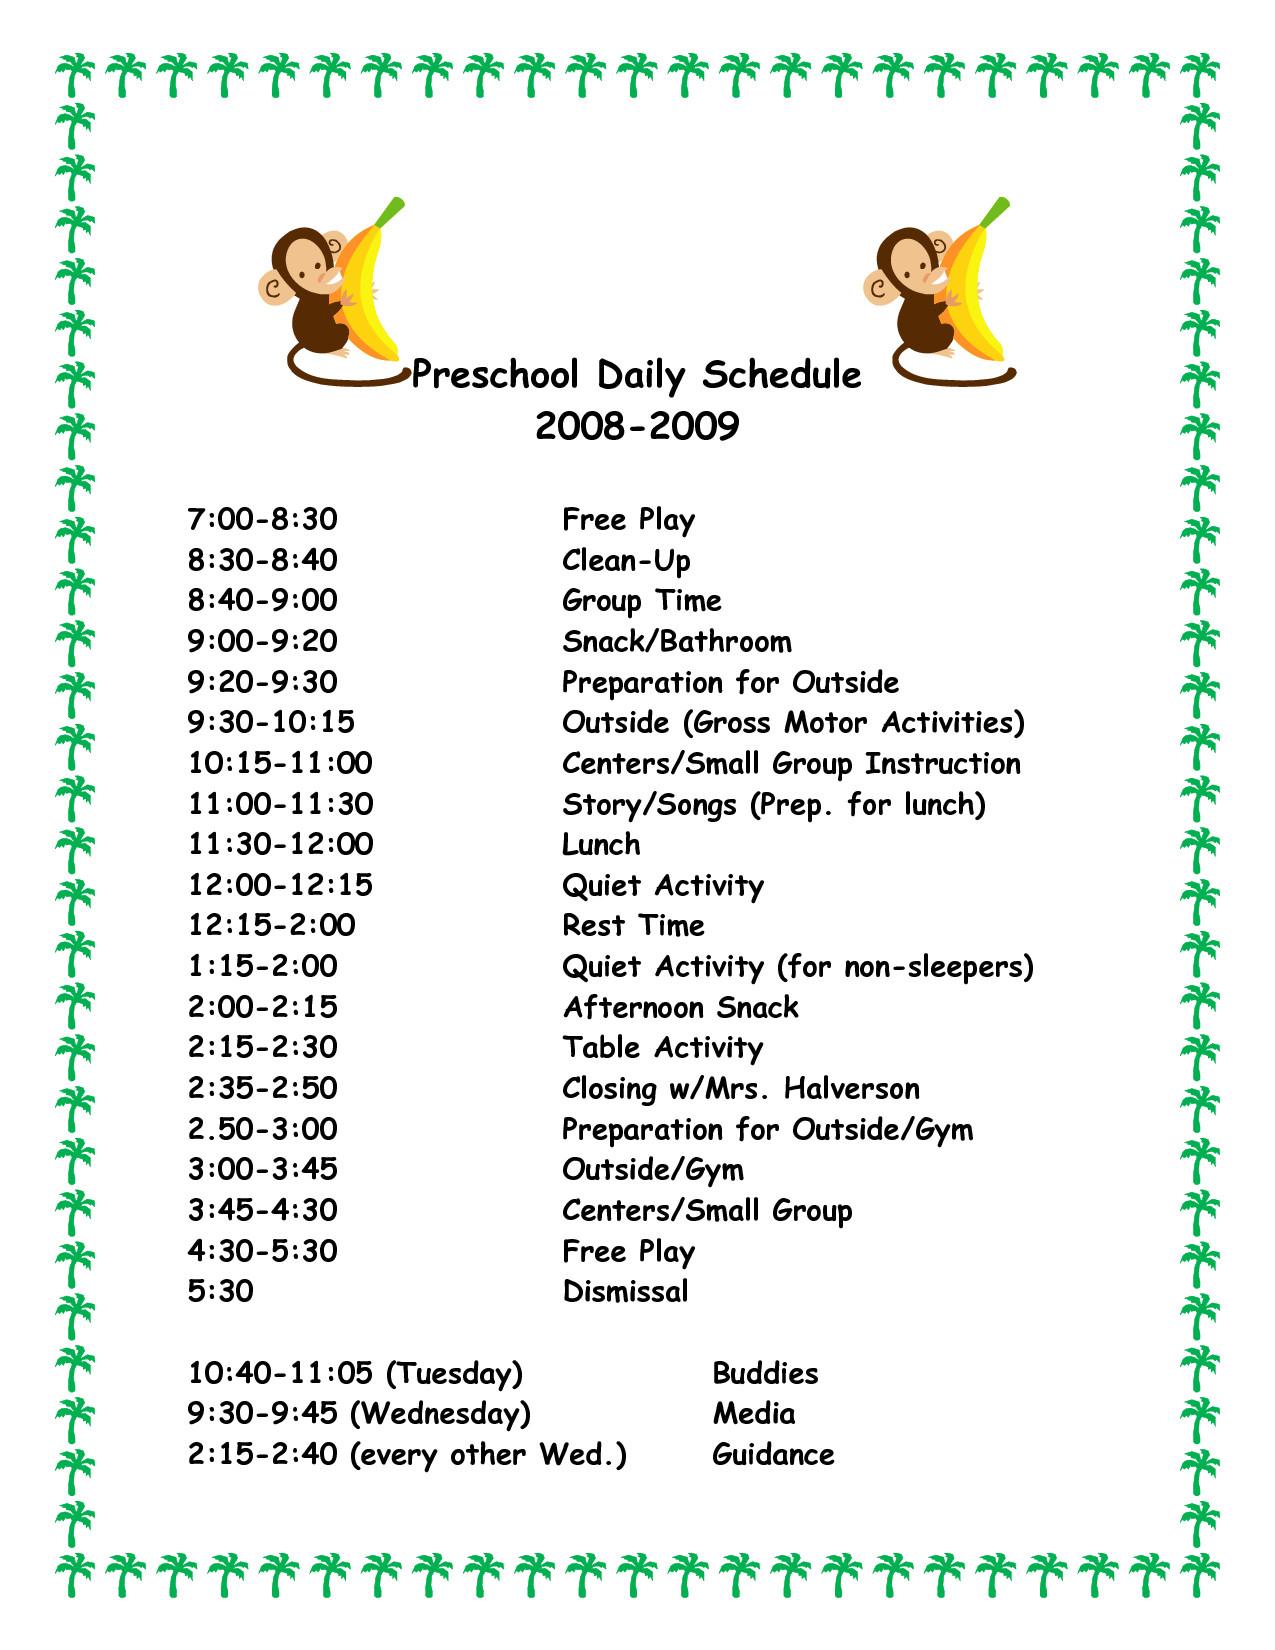 Preschool Daily Schedule Template Daily Schedule Template for Preschool